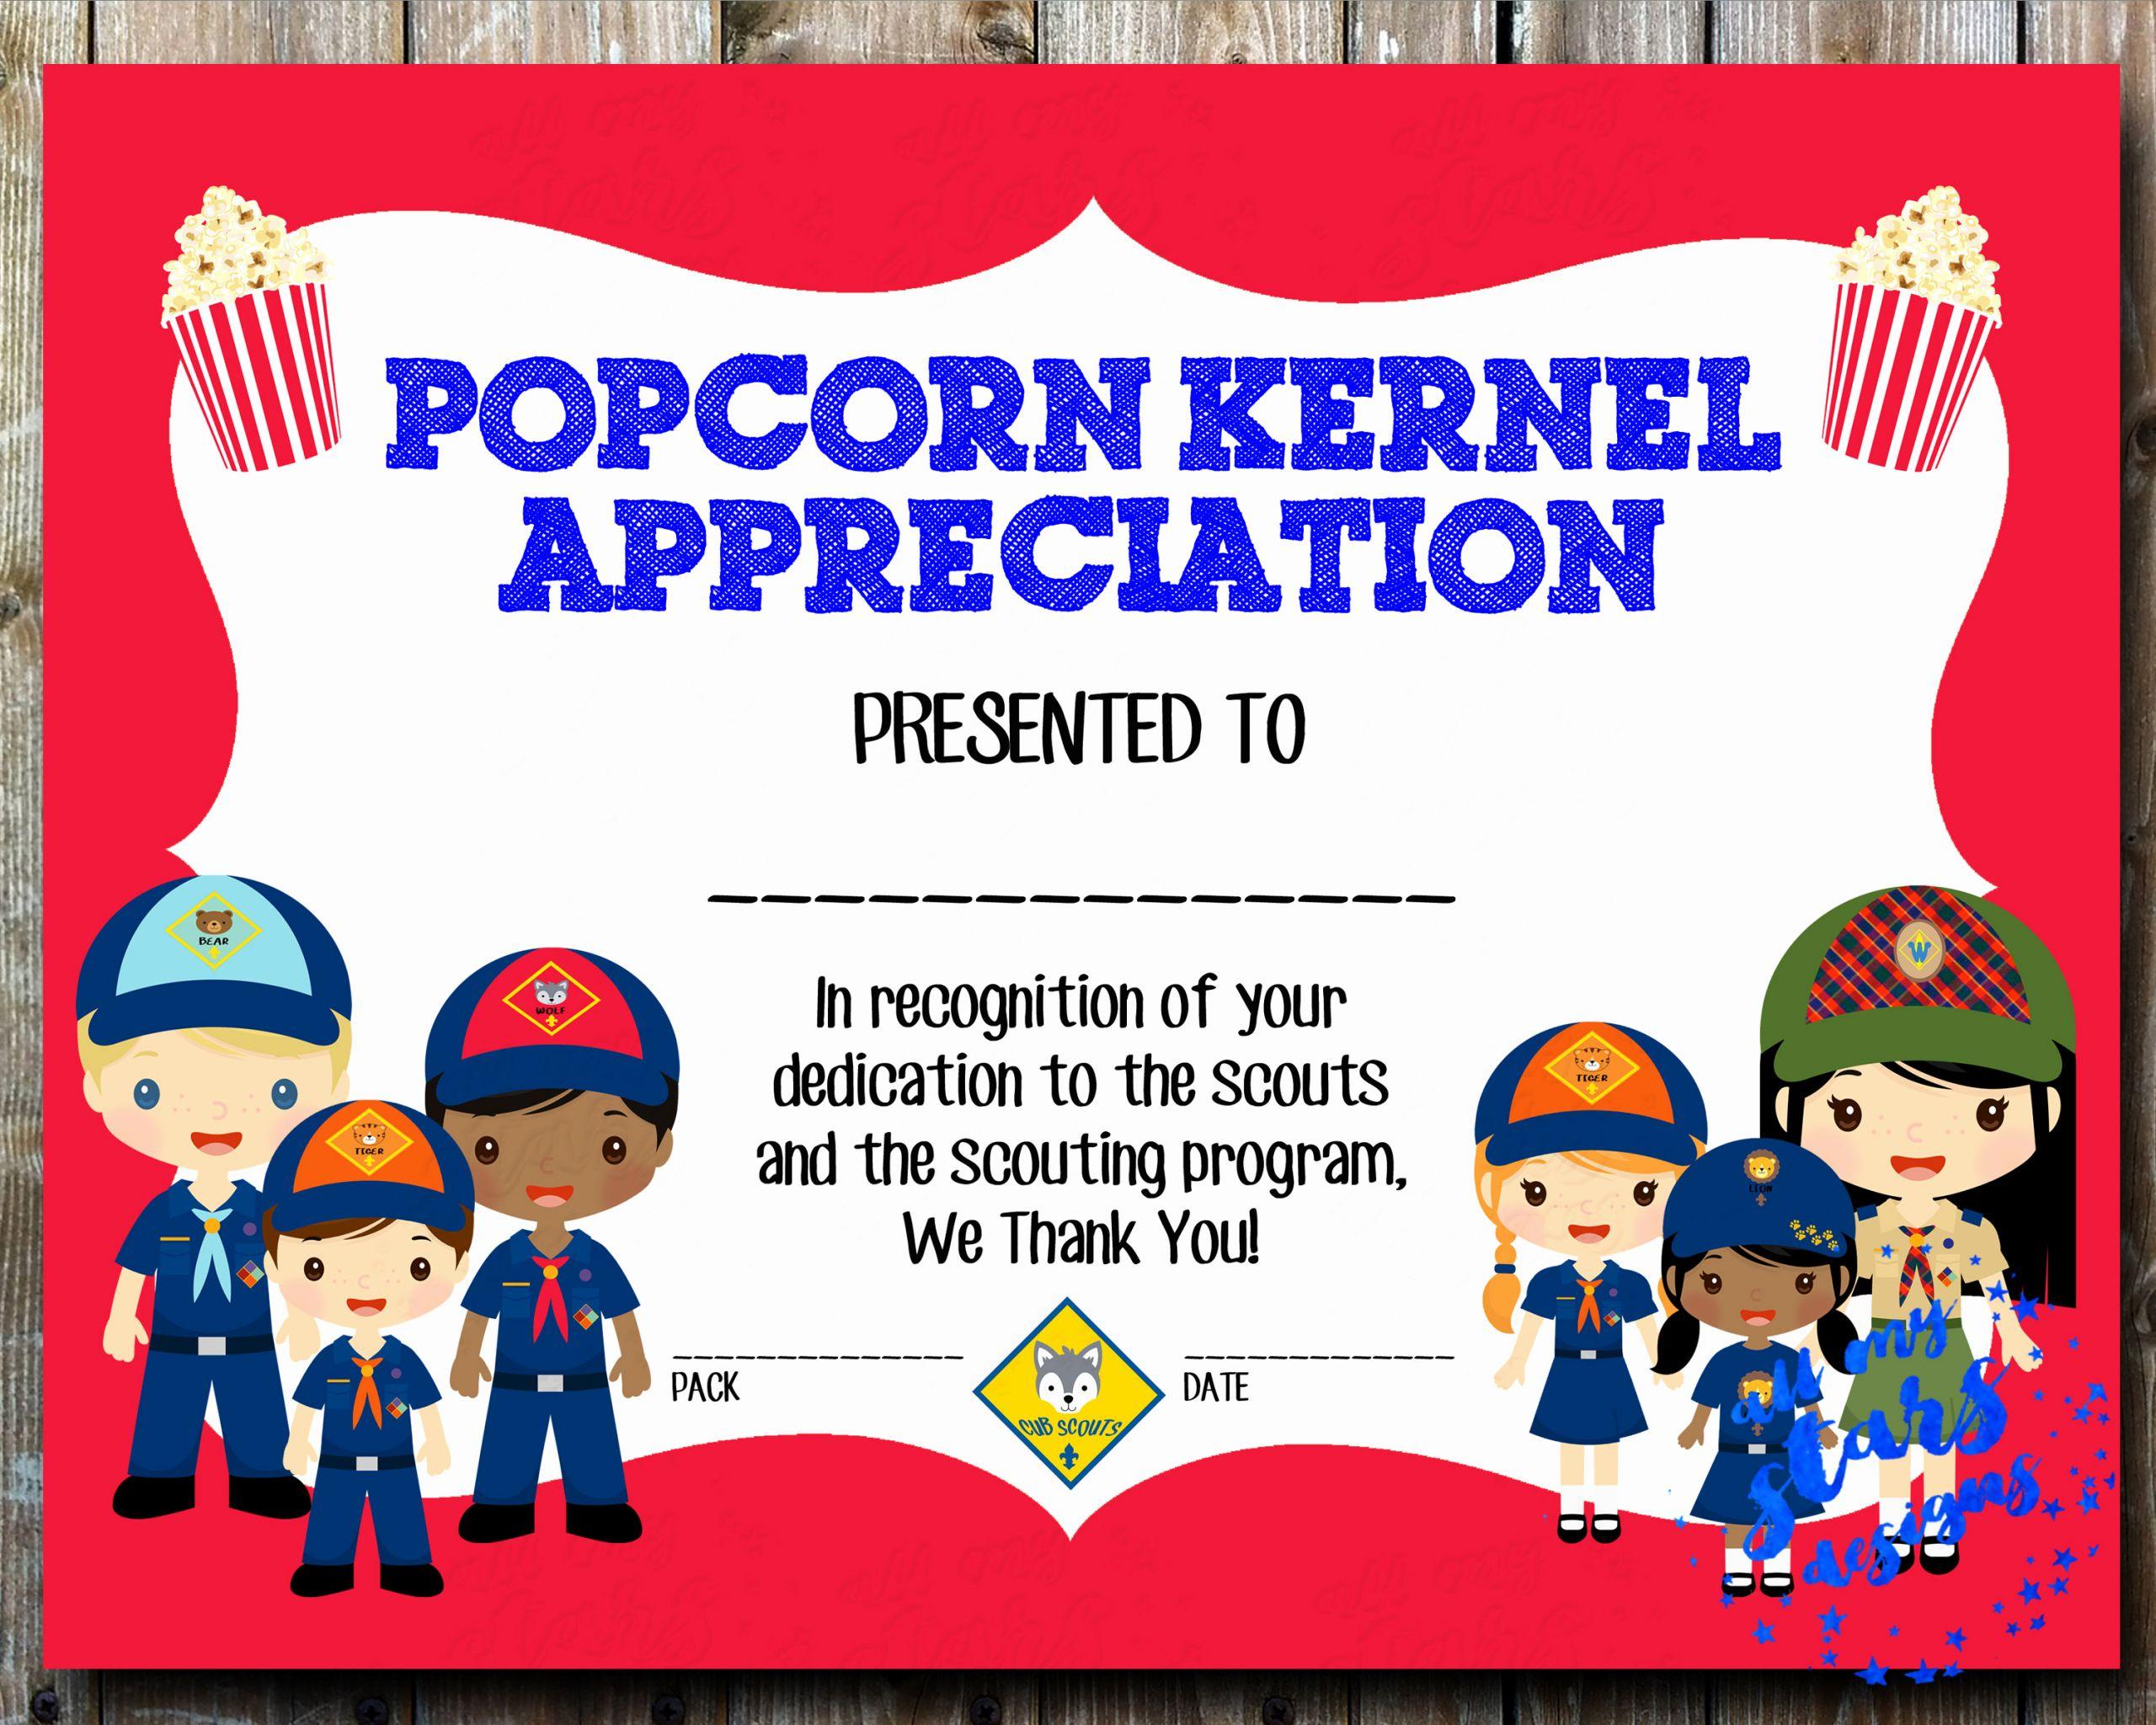 Cub Scout Certificate Of Appreciation Template Awesome Cub Scout Popcorn Kernel Appreciation Award